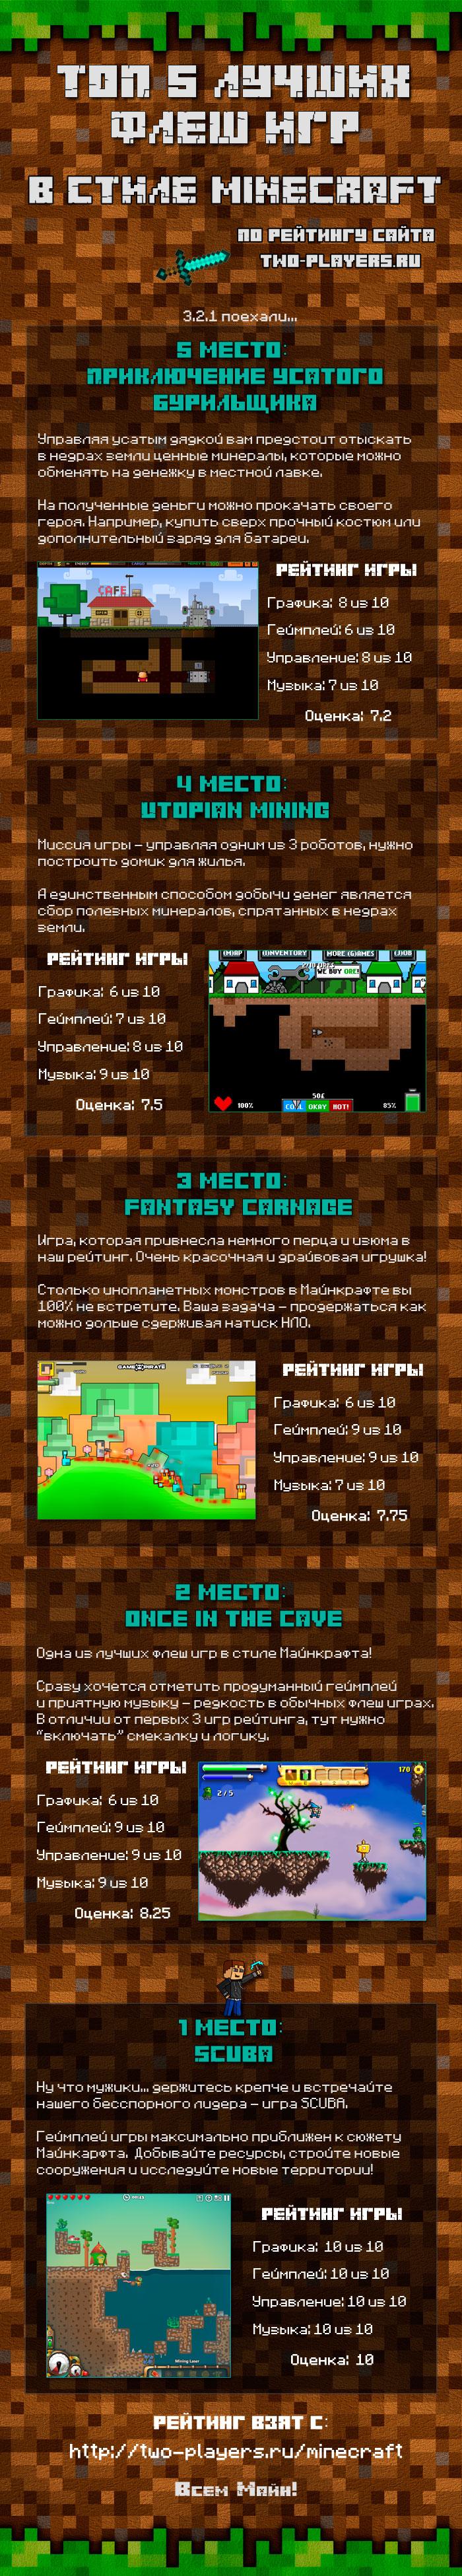 Онлайн игры Майнкрафт: ТОП 5